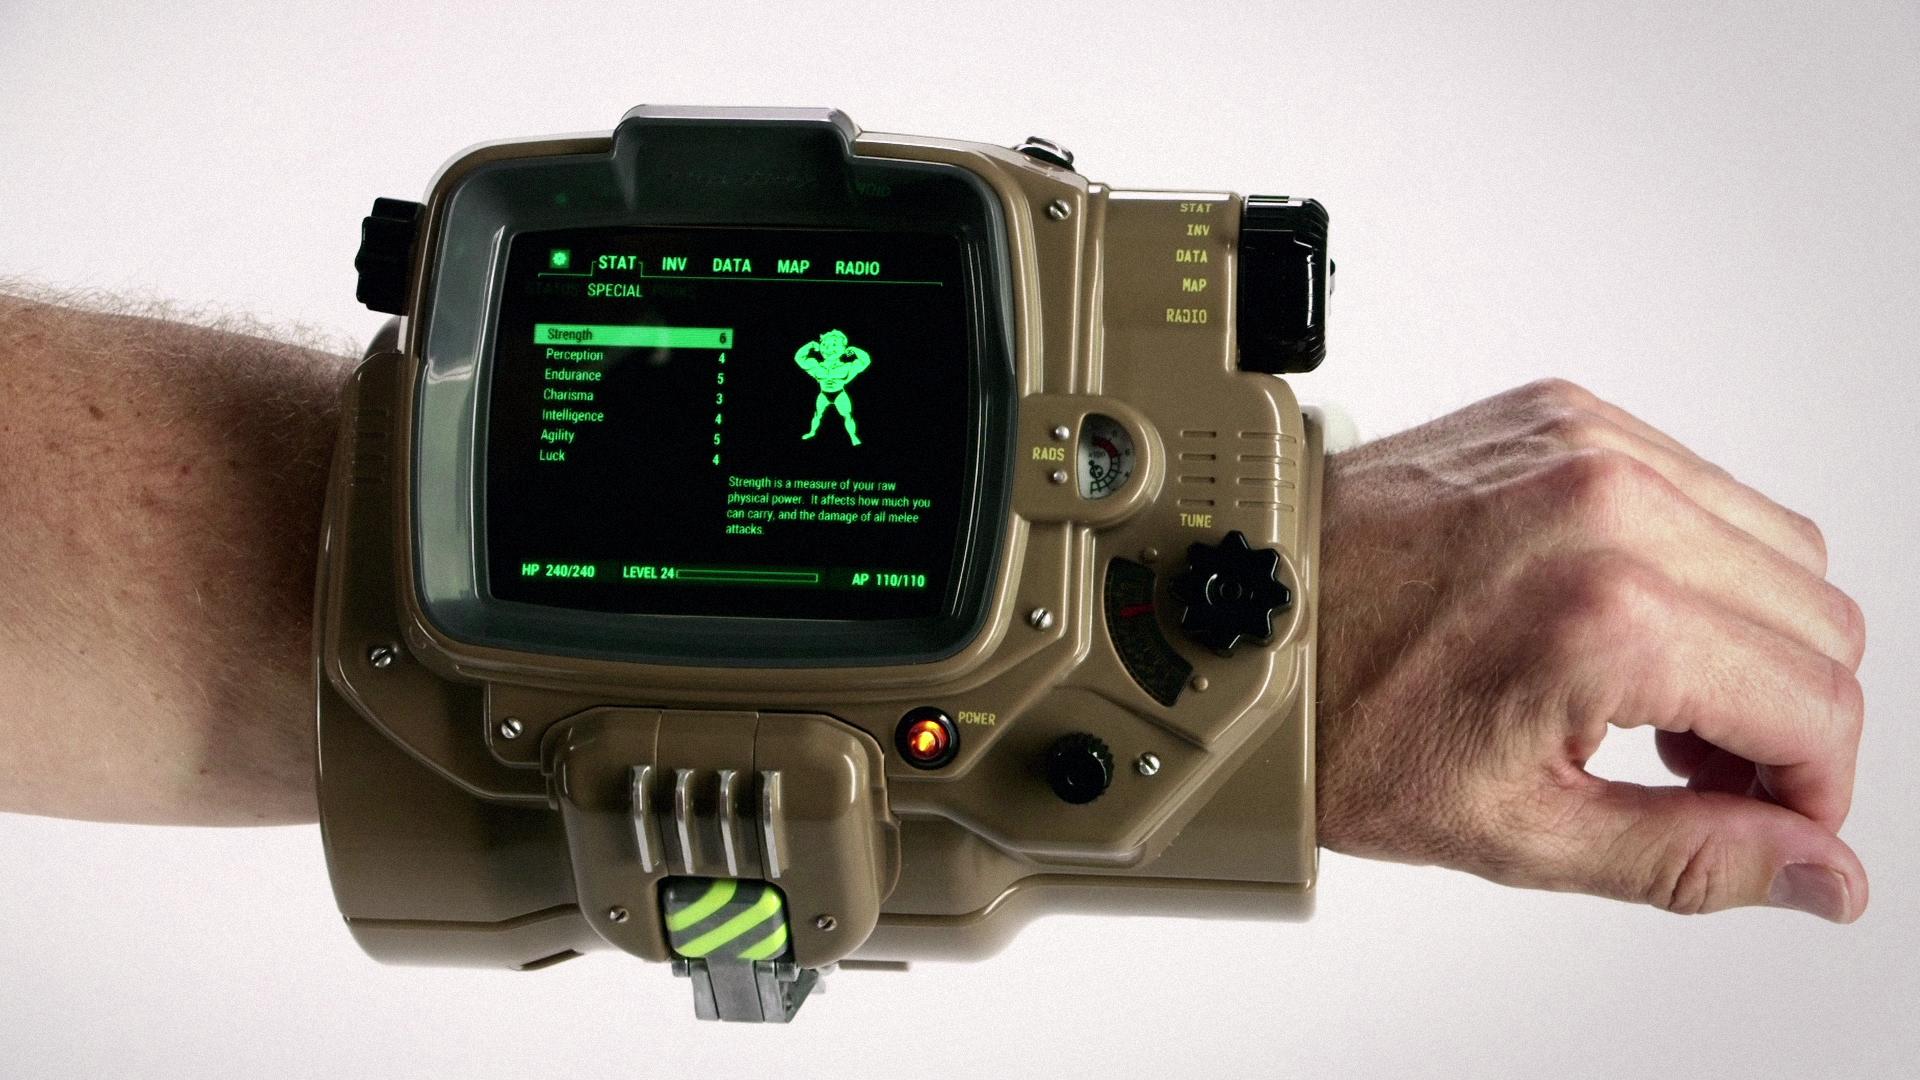 Bethesda и Fallout: все новости с конференции на Е3 - 7